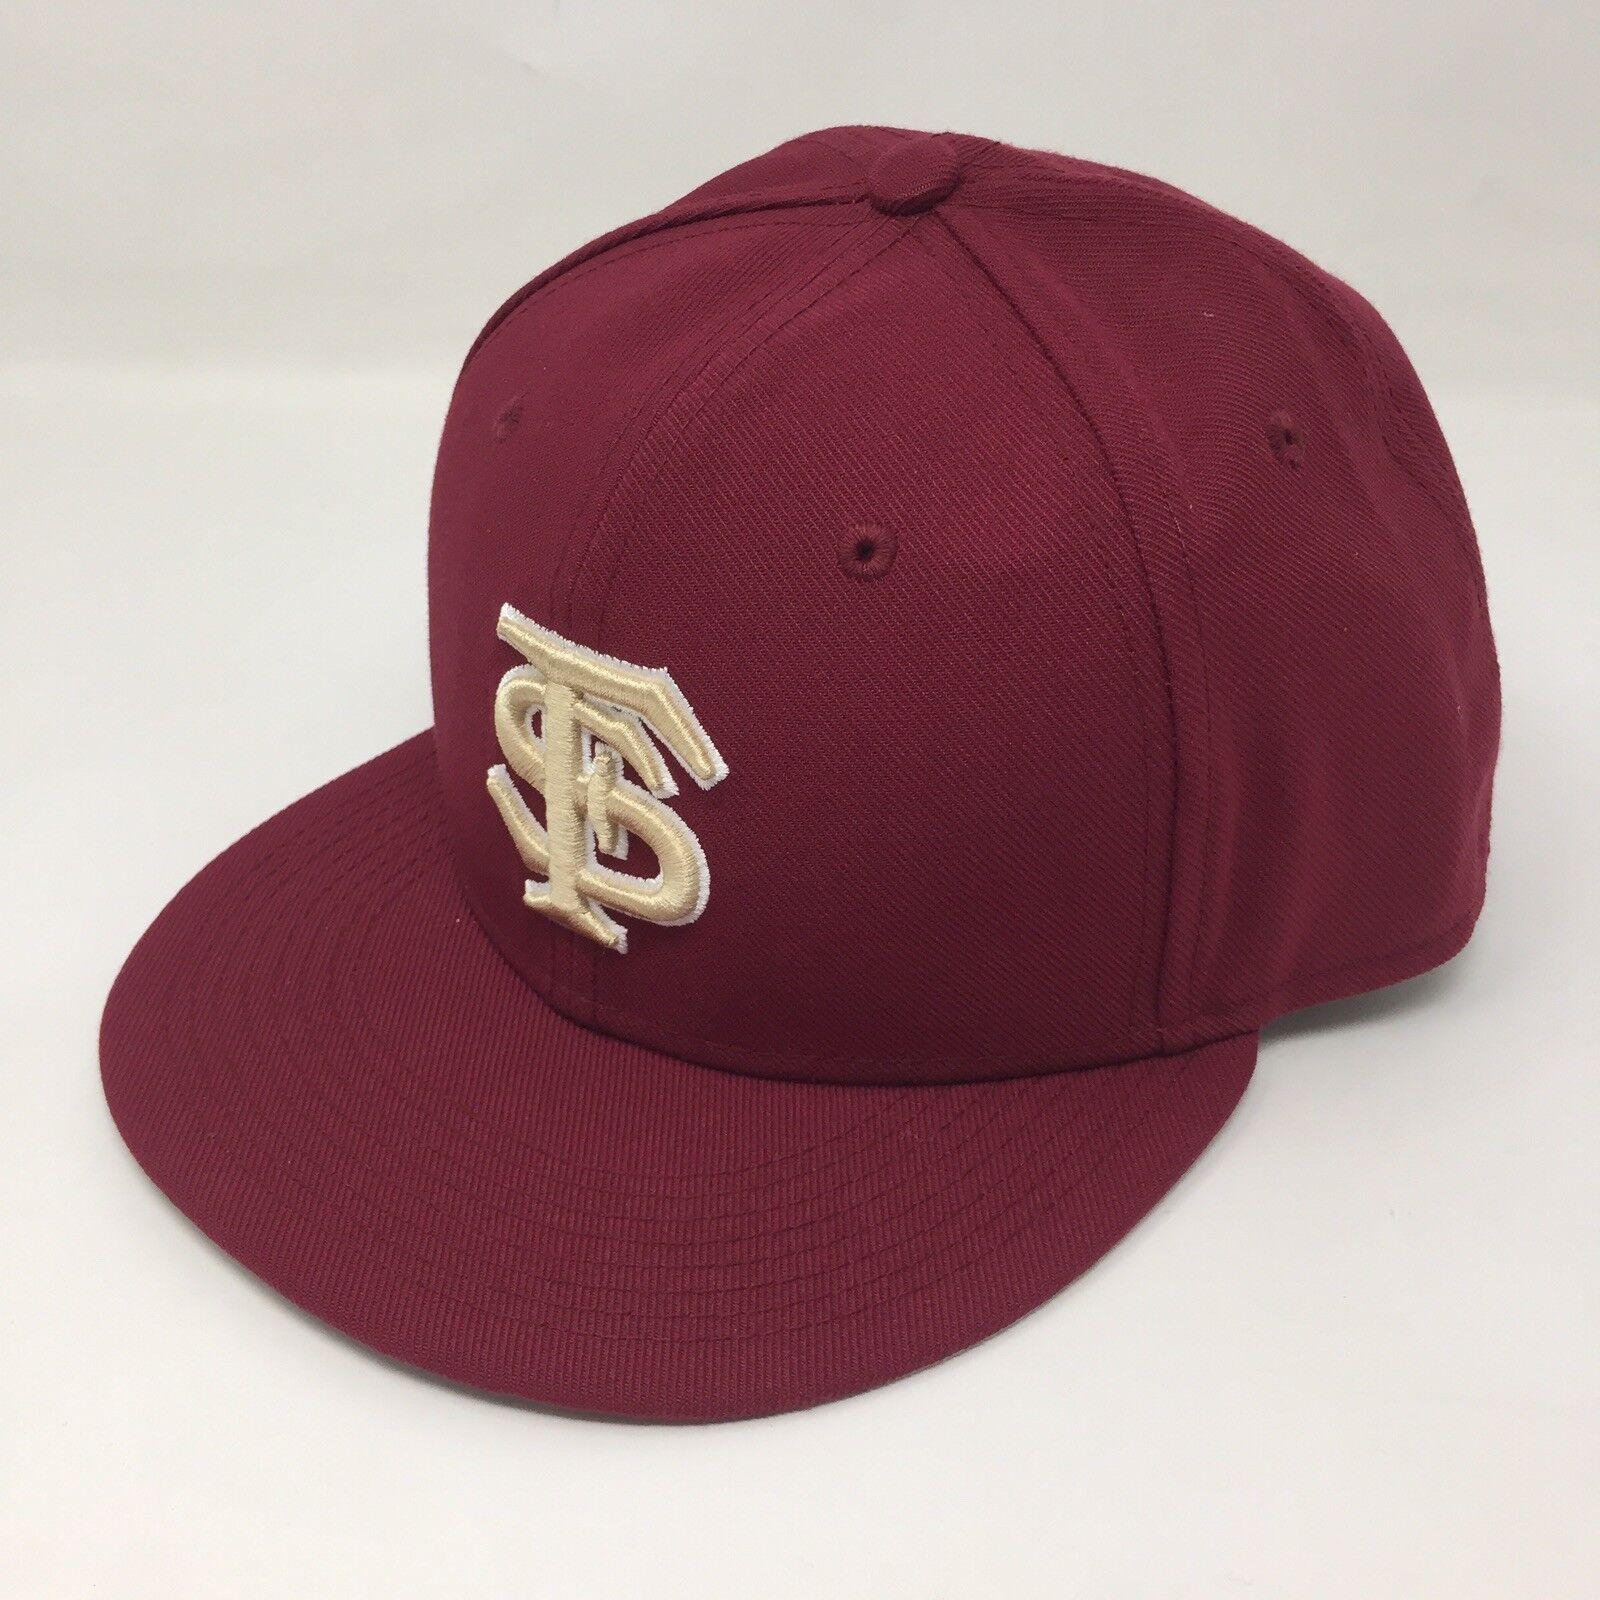 online store 03edf caa79 italy nike true sz 7 drifit 3 8 florida state seminoles drifit 7 maroon  baseball hat